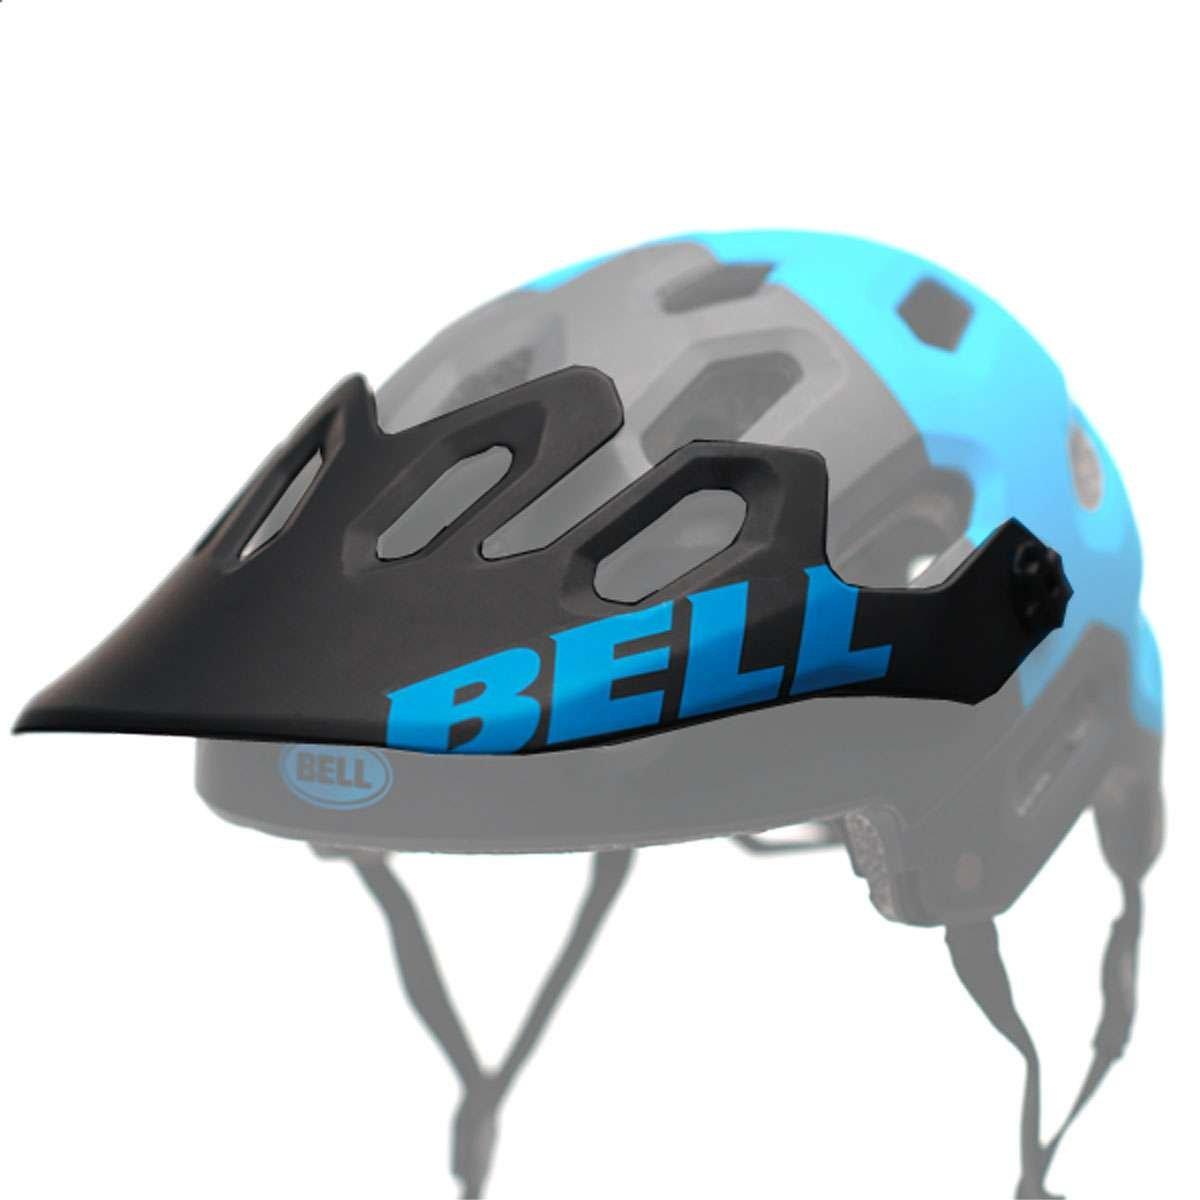 Bell Super 2/2R Helmet - Replacement Visor - Matte Black/Blue Aggression - 8047958